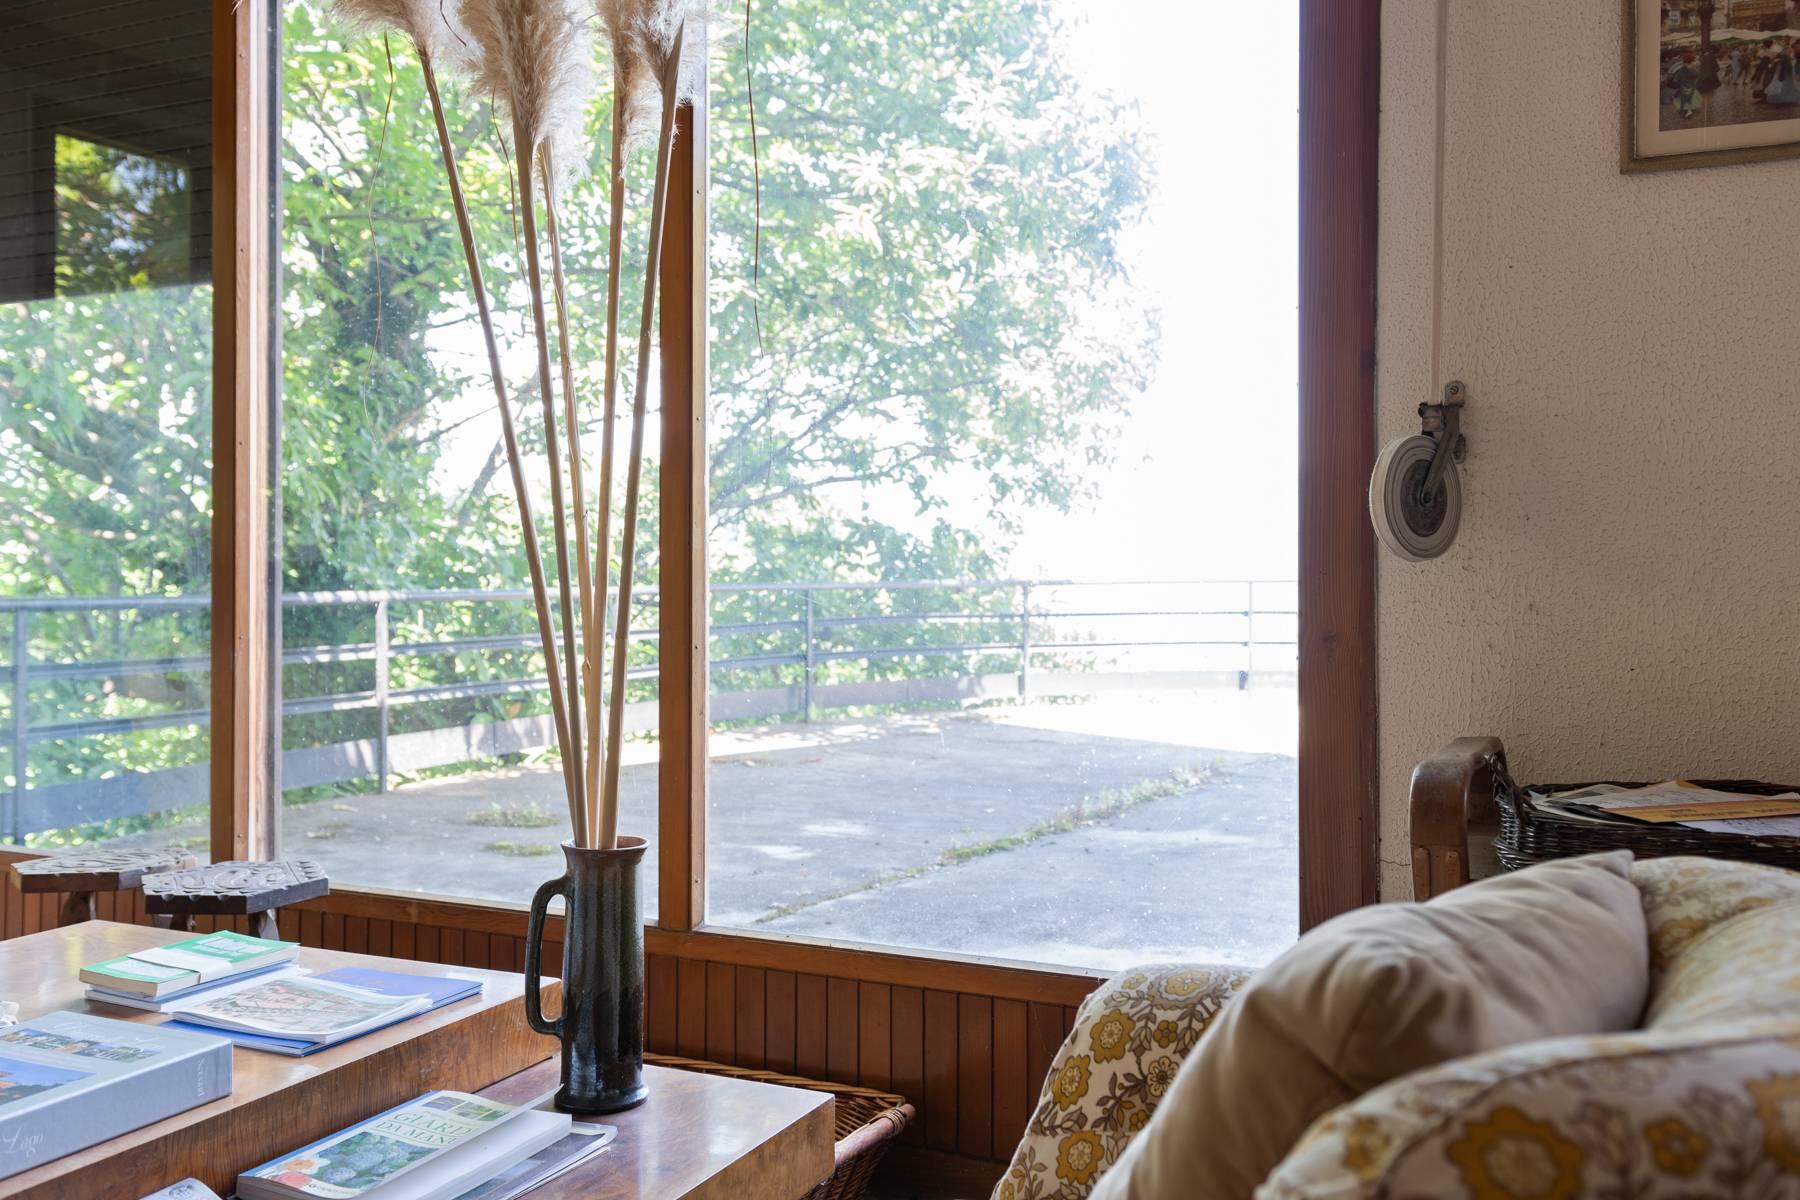 Villa in Vendita a Stresa: 5 locali, 150 mq - Foto 6